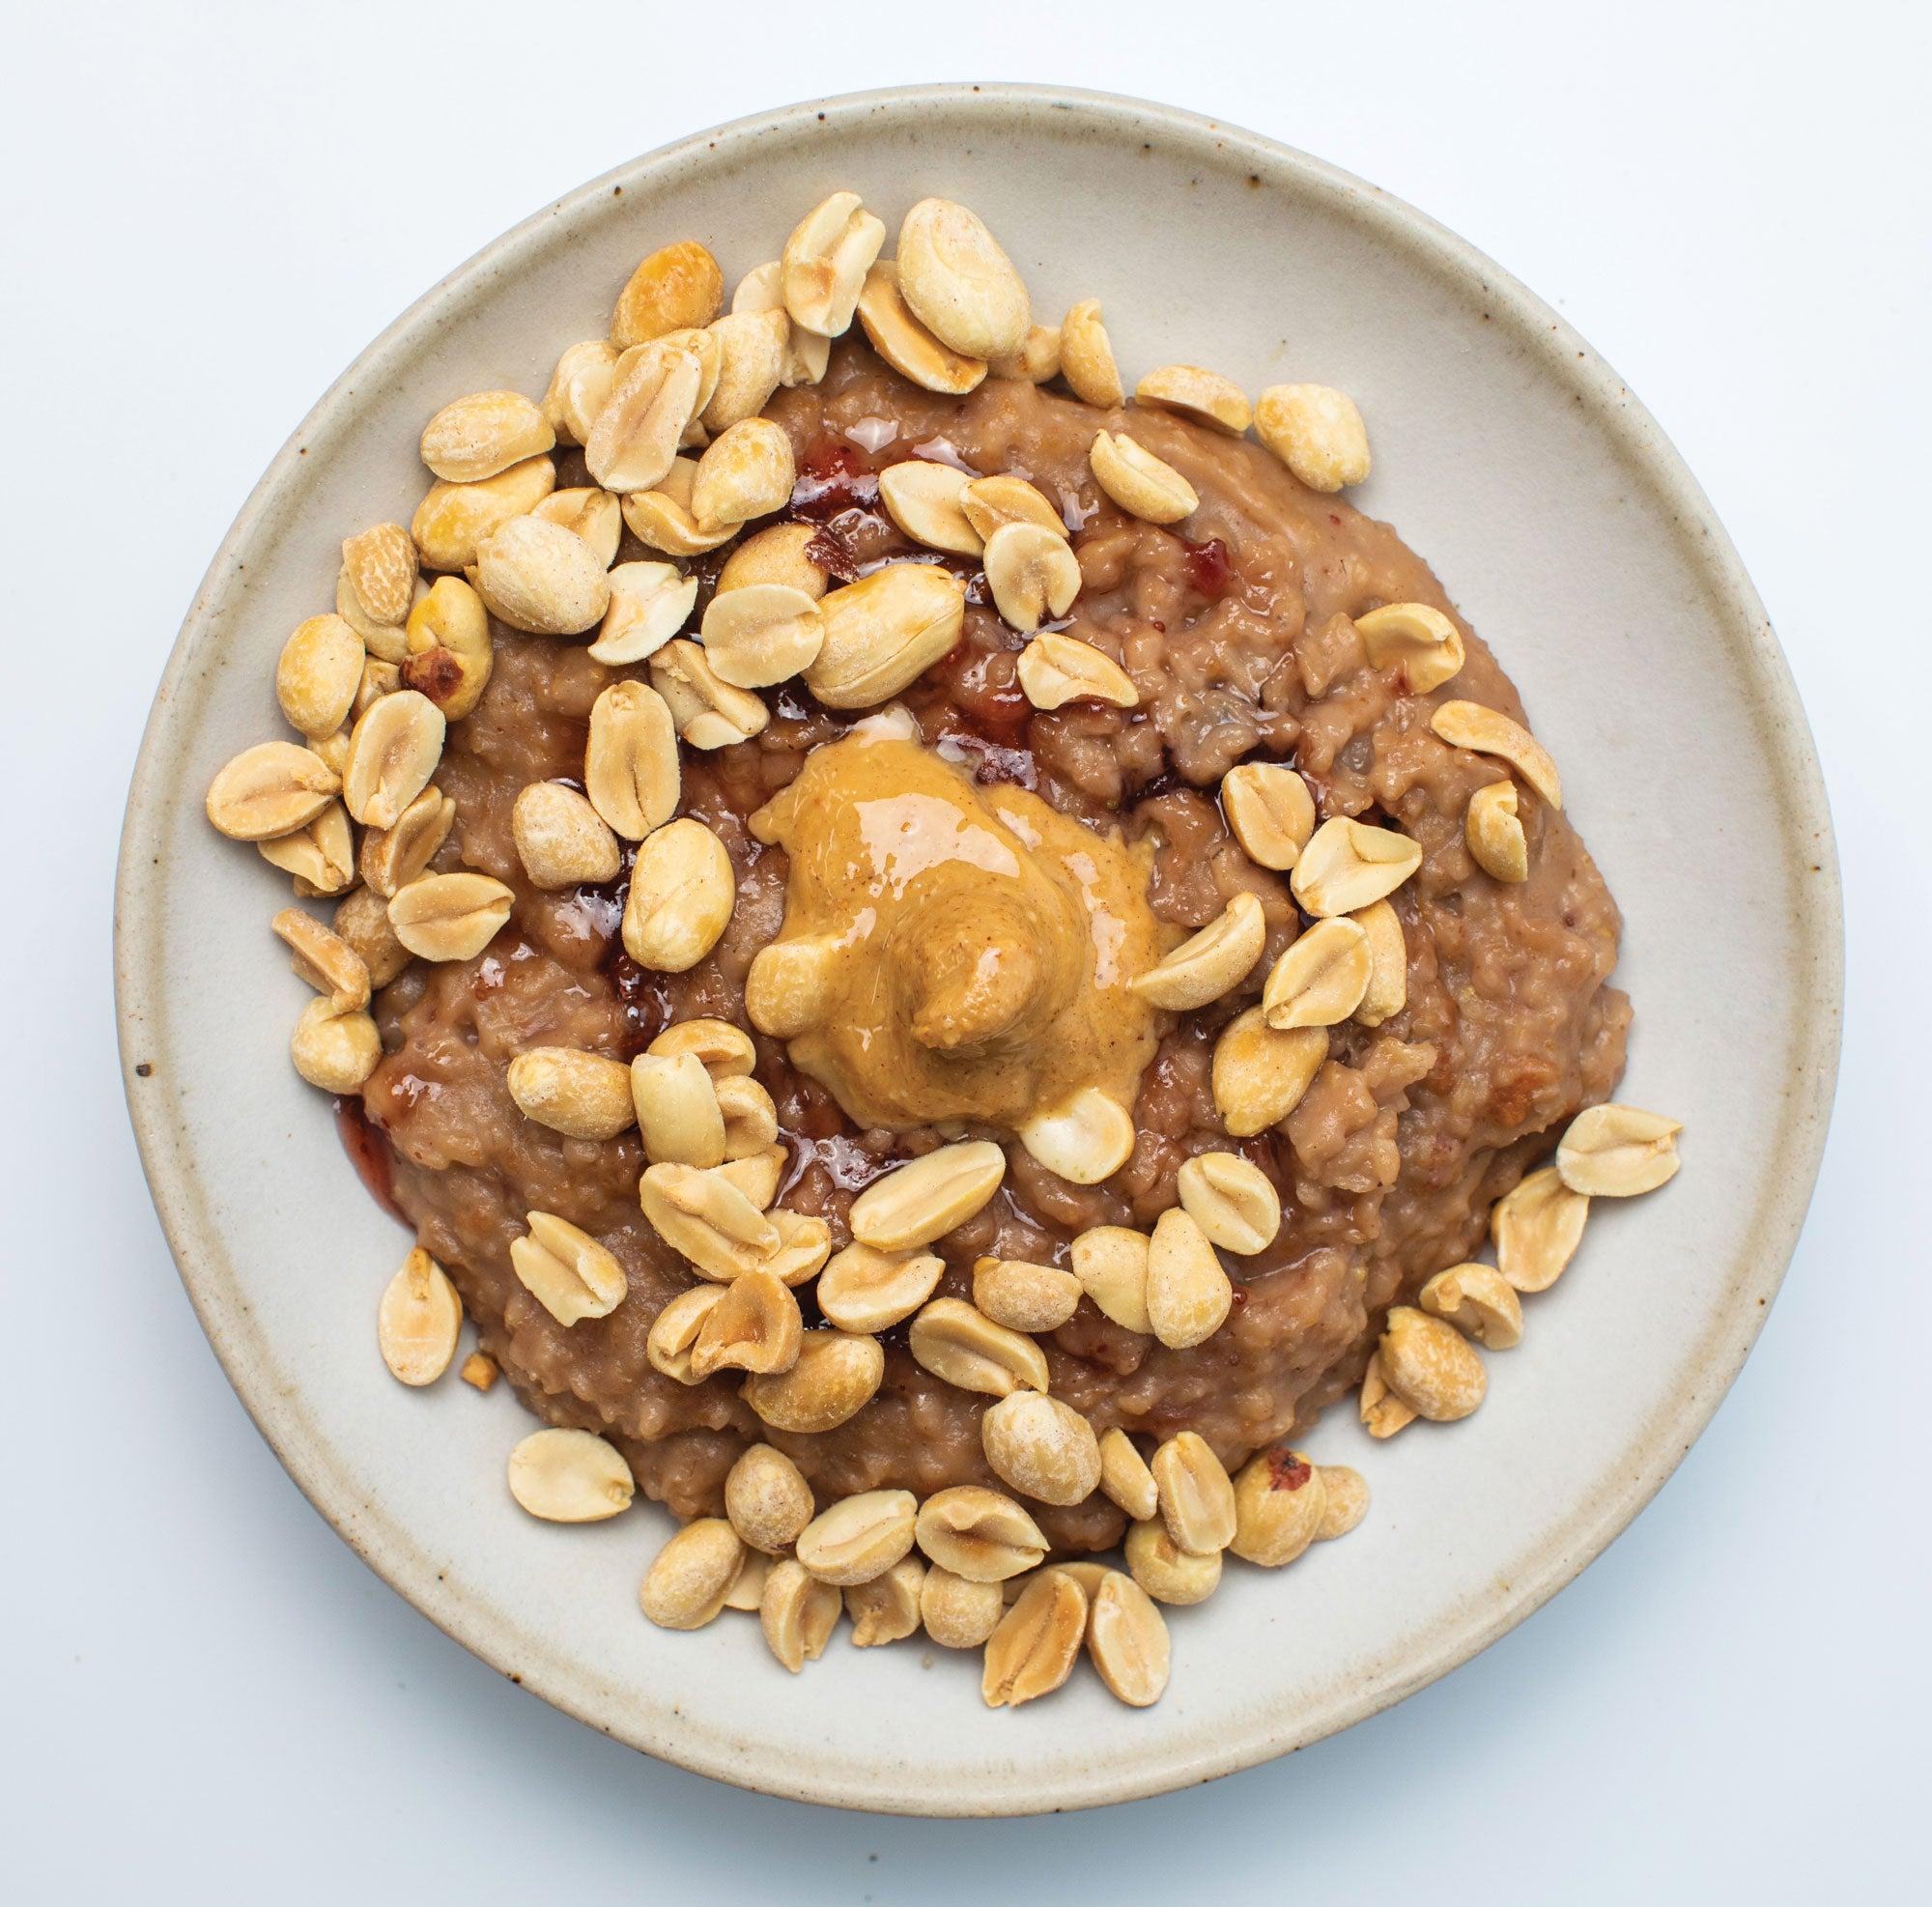 pbj-oatmeail